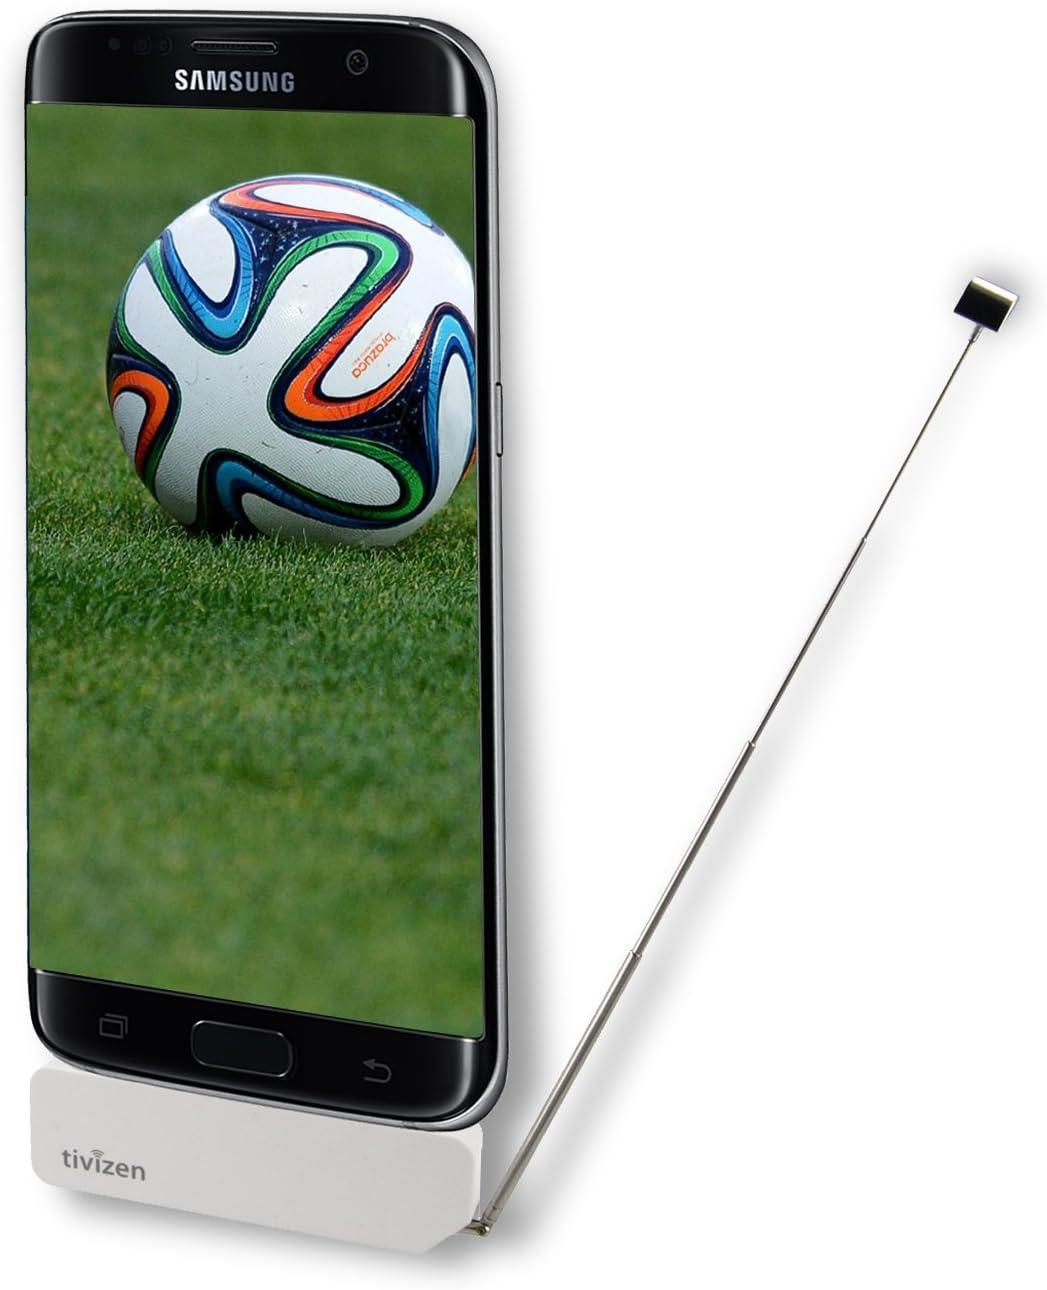 Icube Tivizen Pico - Tarjeta TV/Sat Android